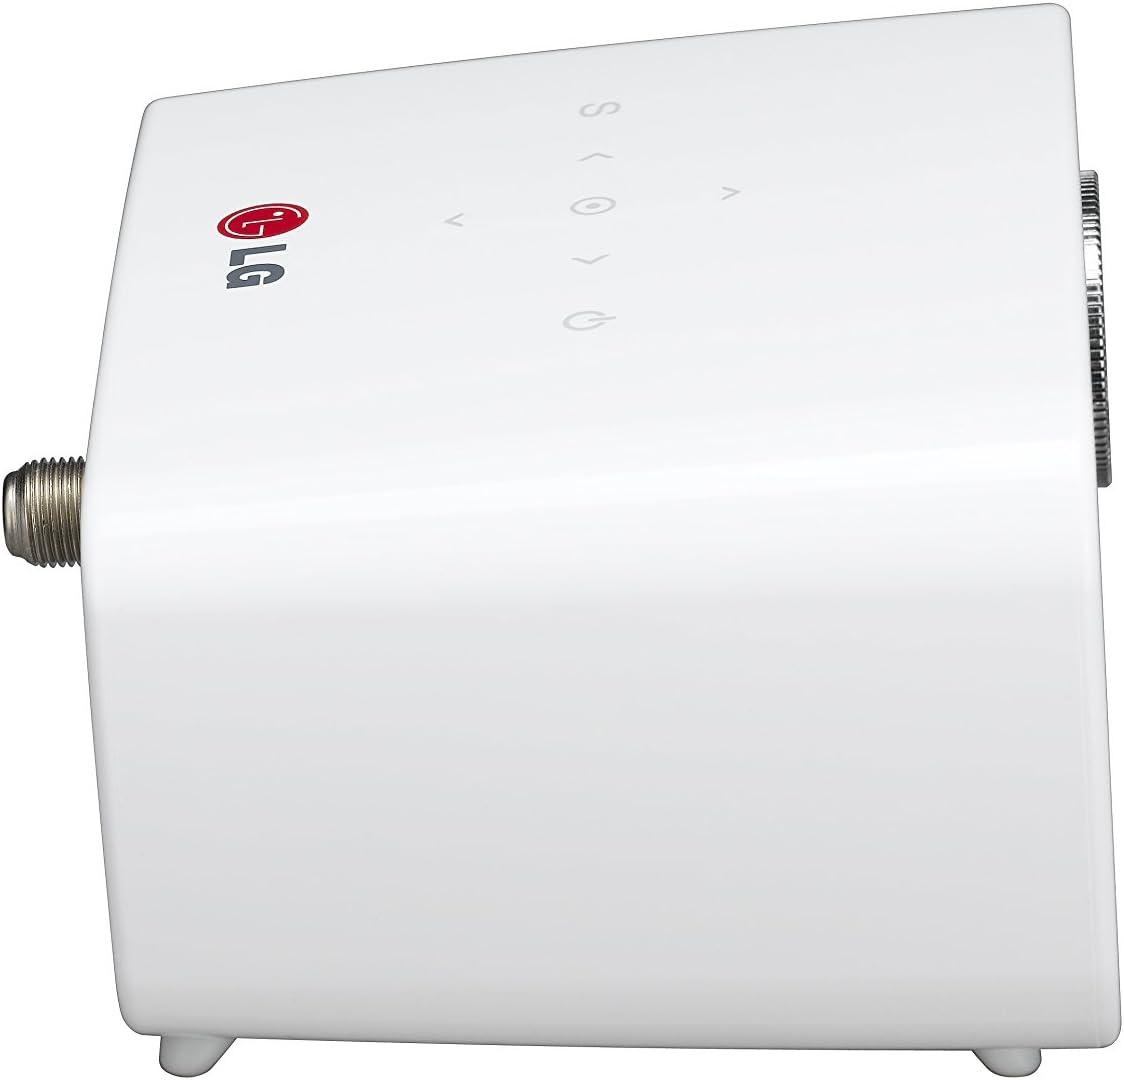 LG PH300 - Proyector (300 lúmenes ANSI, DLP, 720p (1280x720 ...